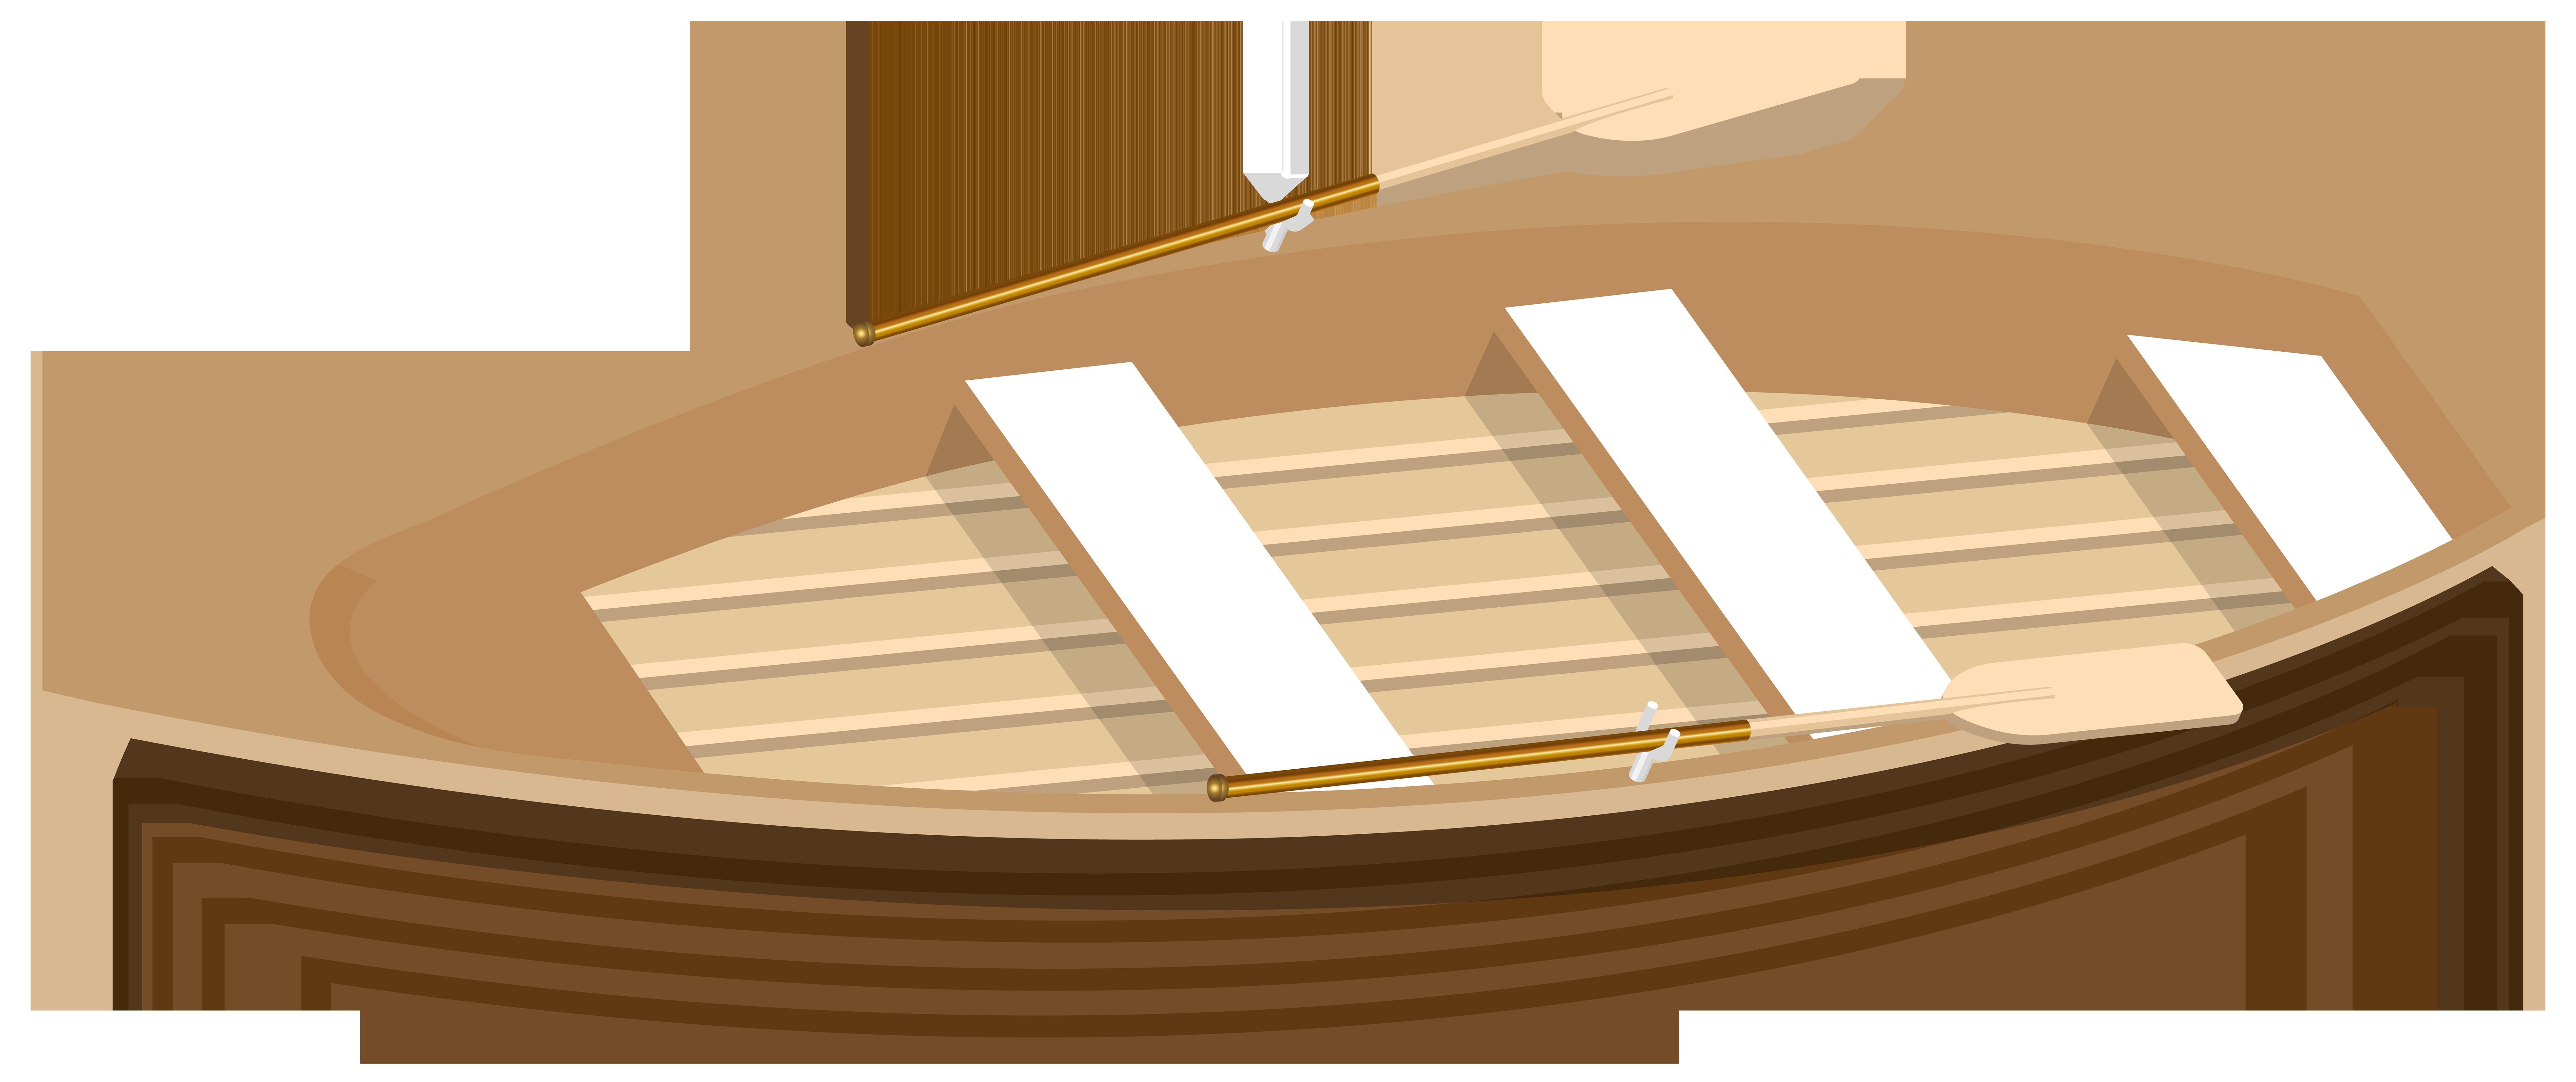 Wooden Boat Transparent PNG Clip Art Image.